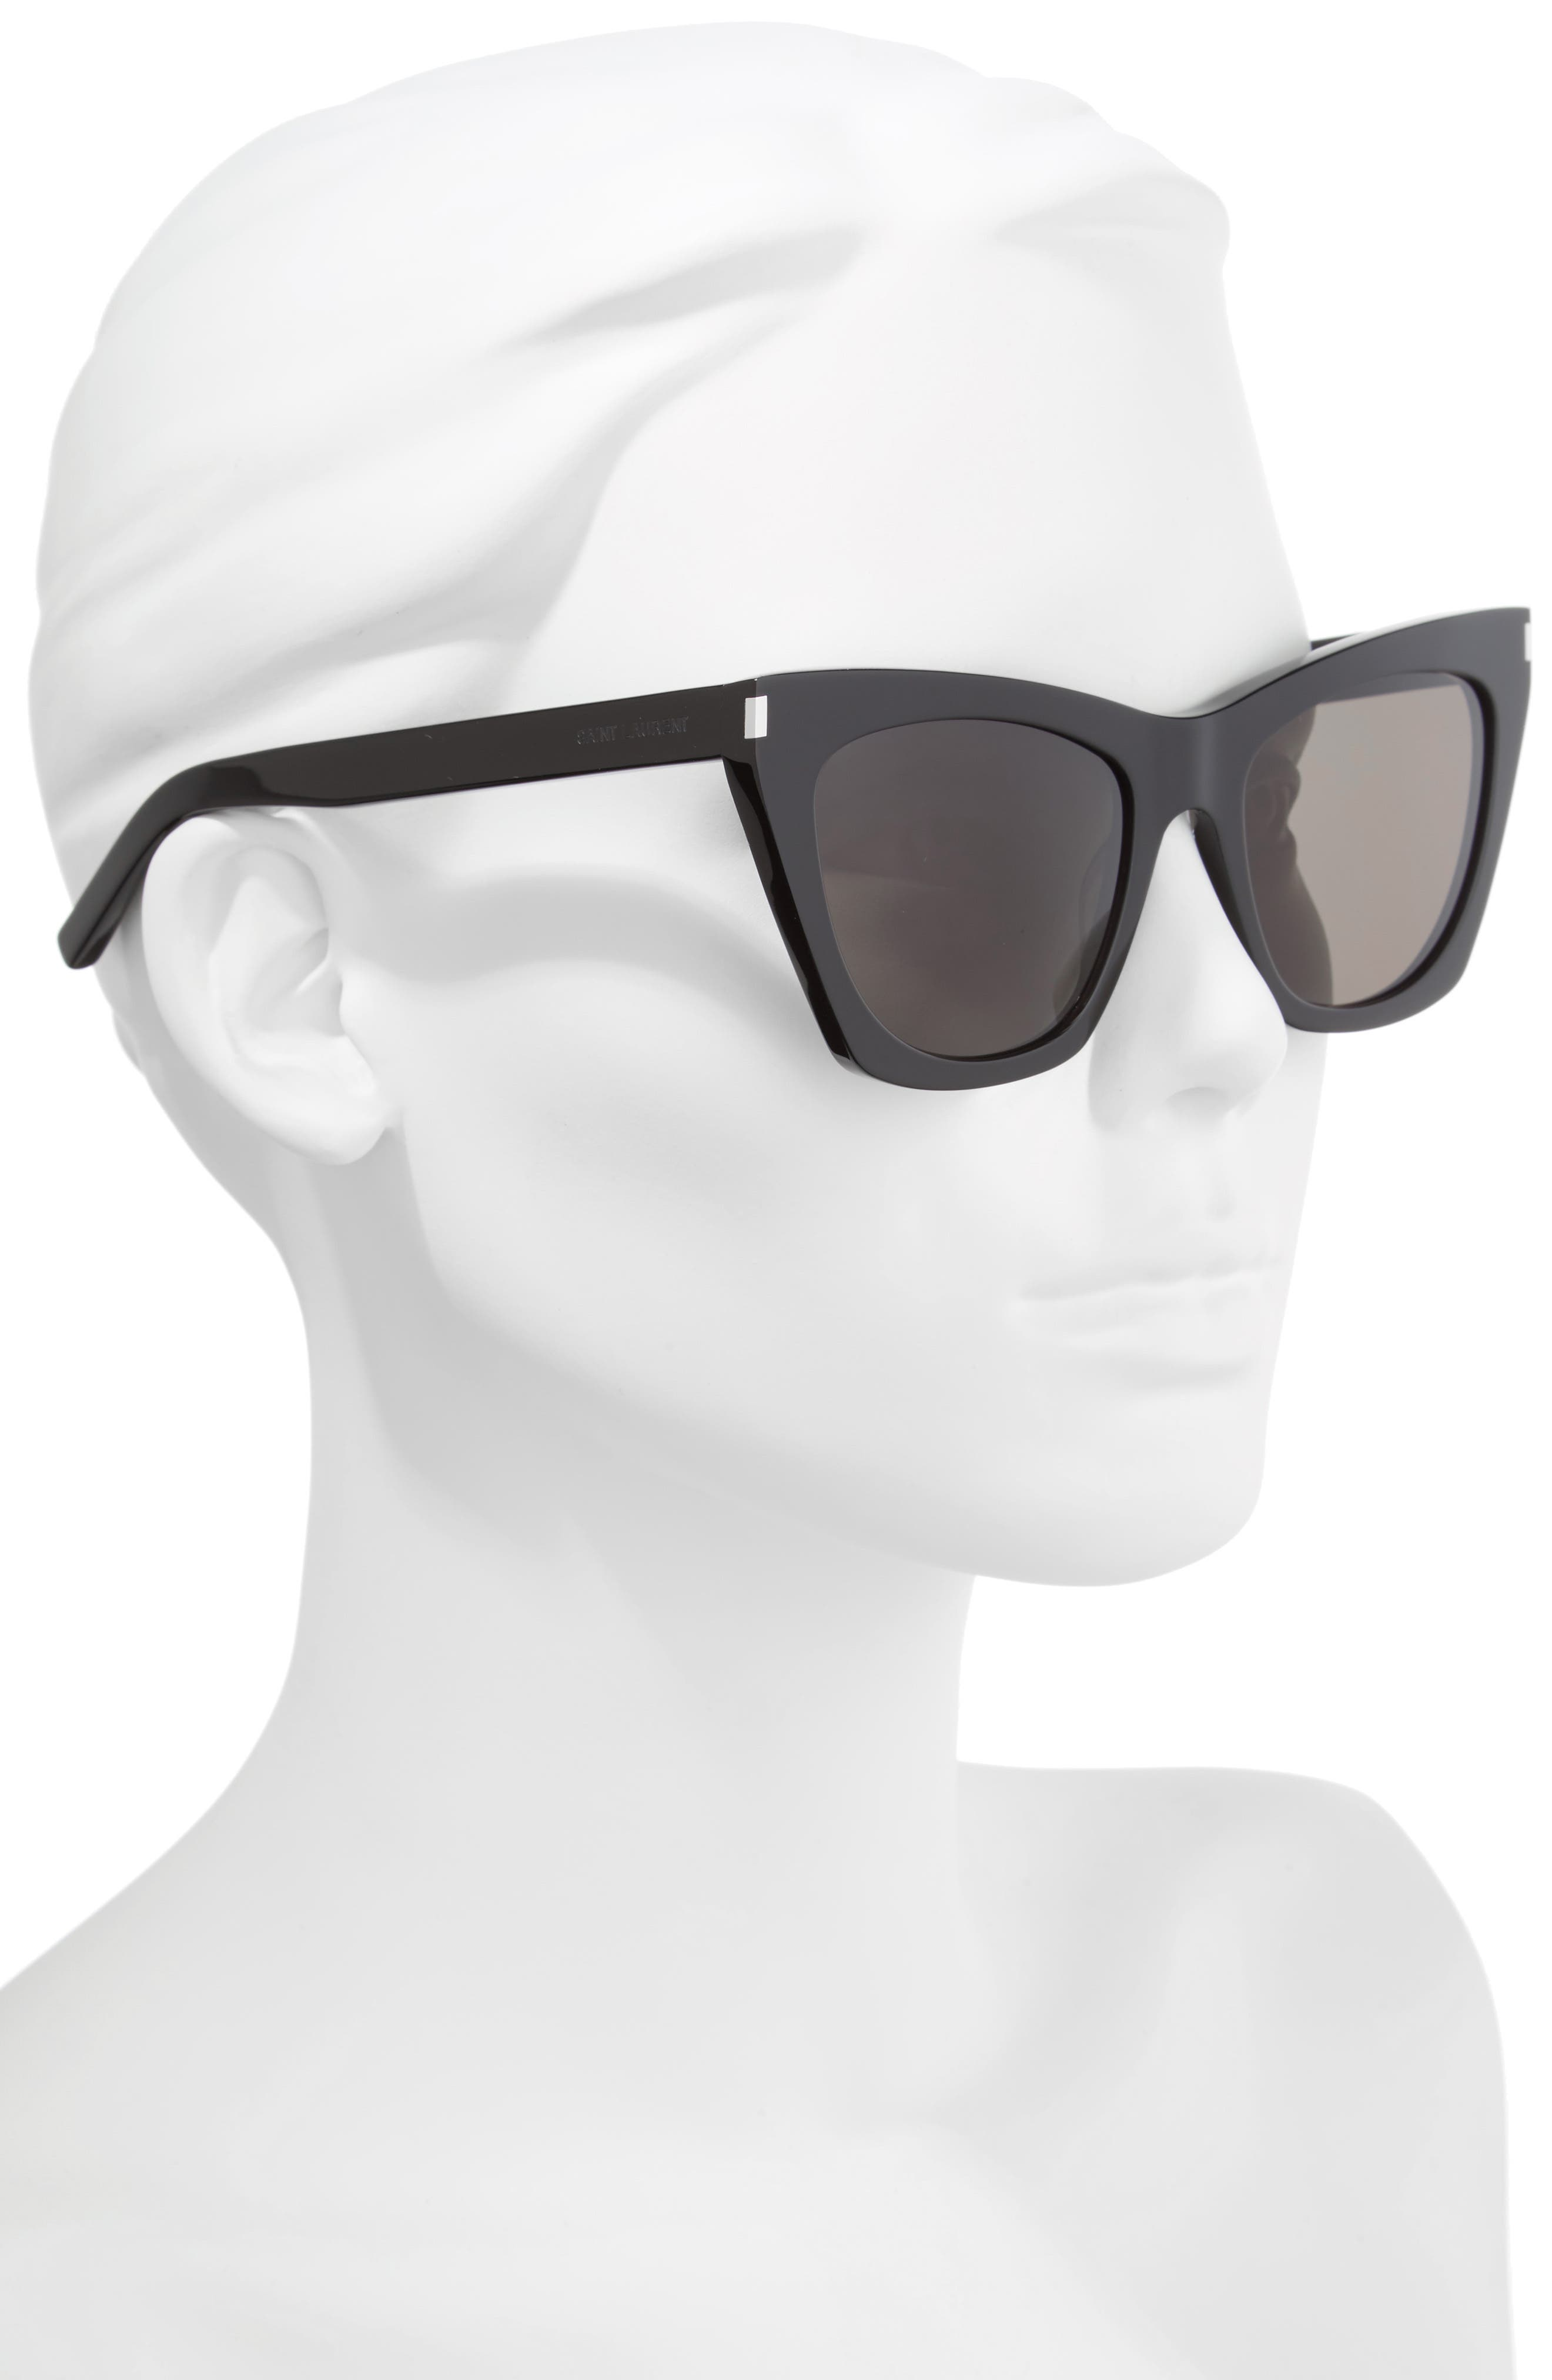 SAINT LAURENT, Kate 55mm Cat Eye Sunglasses, Alternate thumbnail 2, color, BLACK